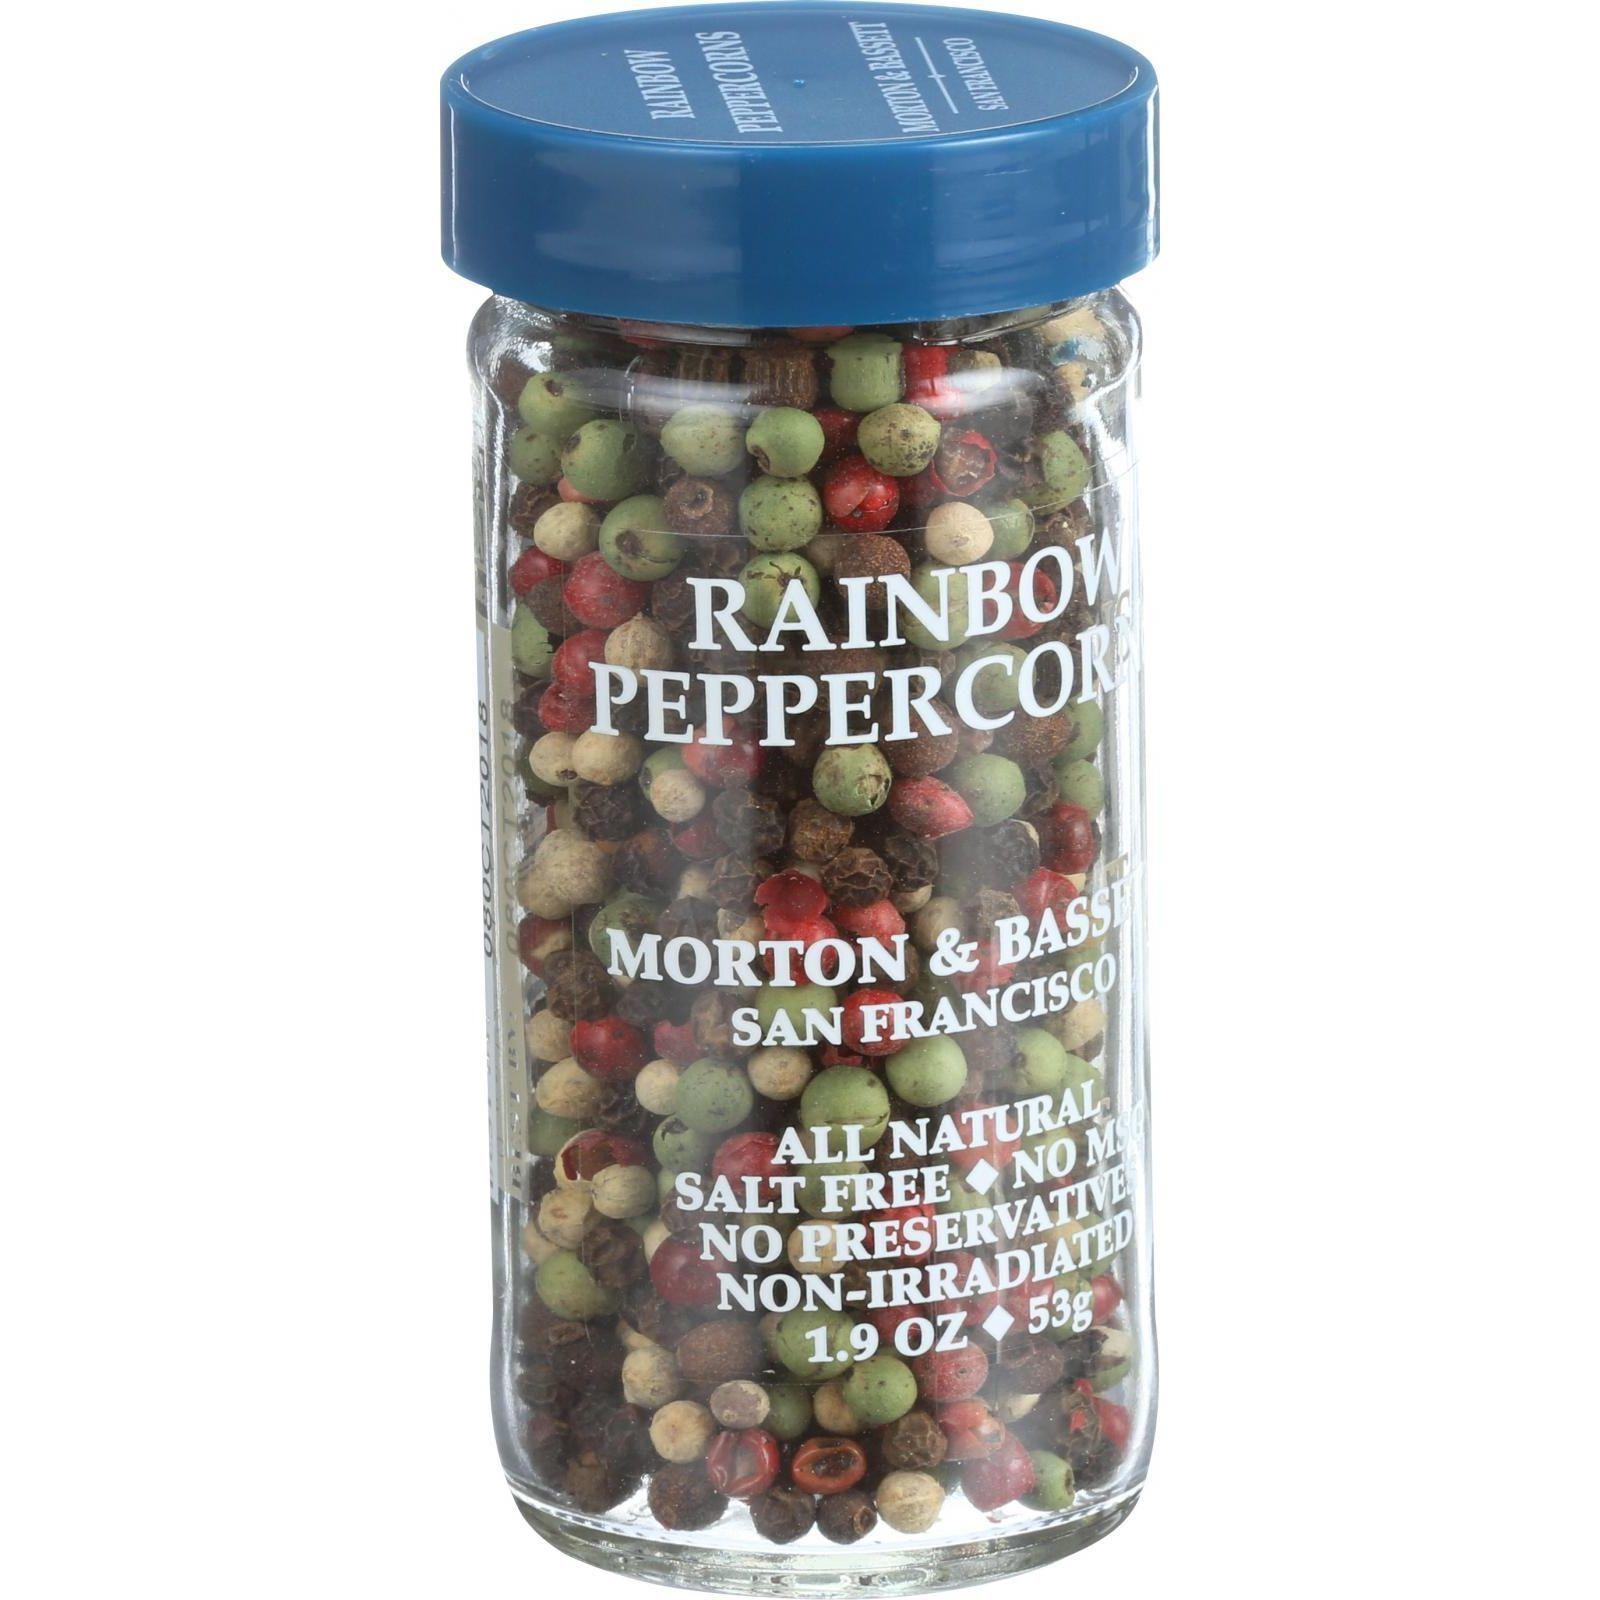 Morton and Bassett Peppercorns - Whole - Rainbow - 1.9 oz - Case of 3